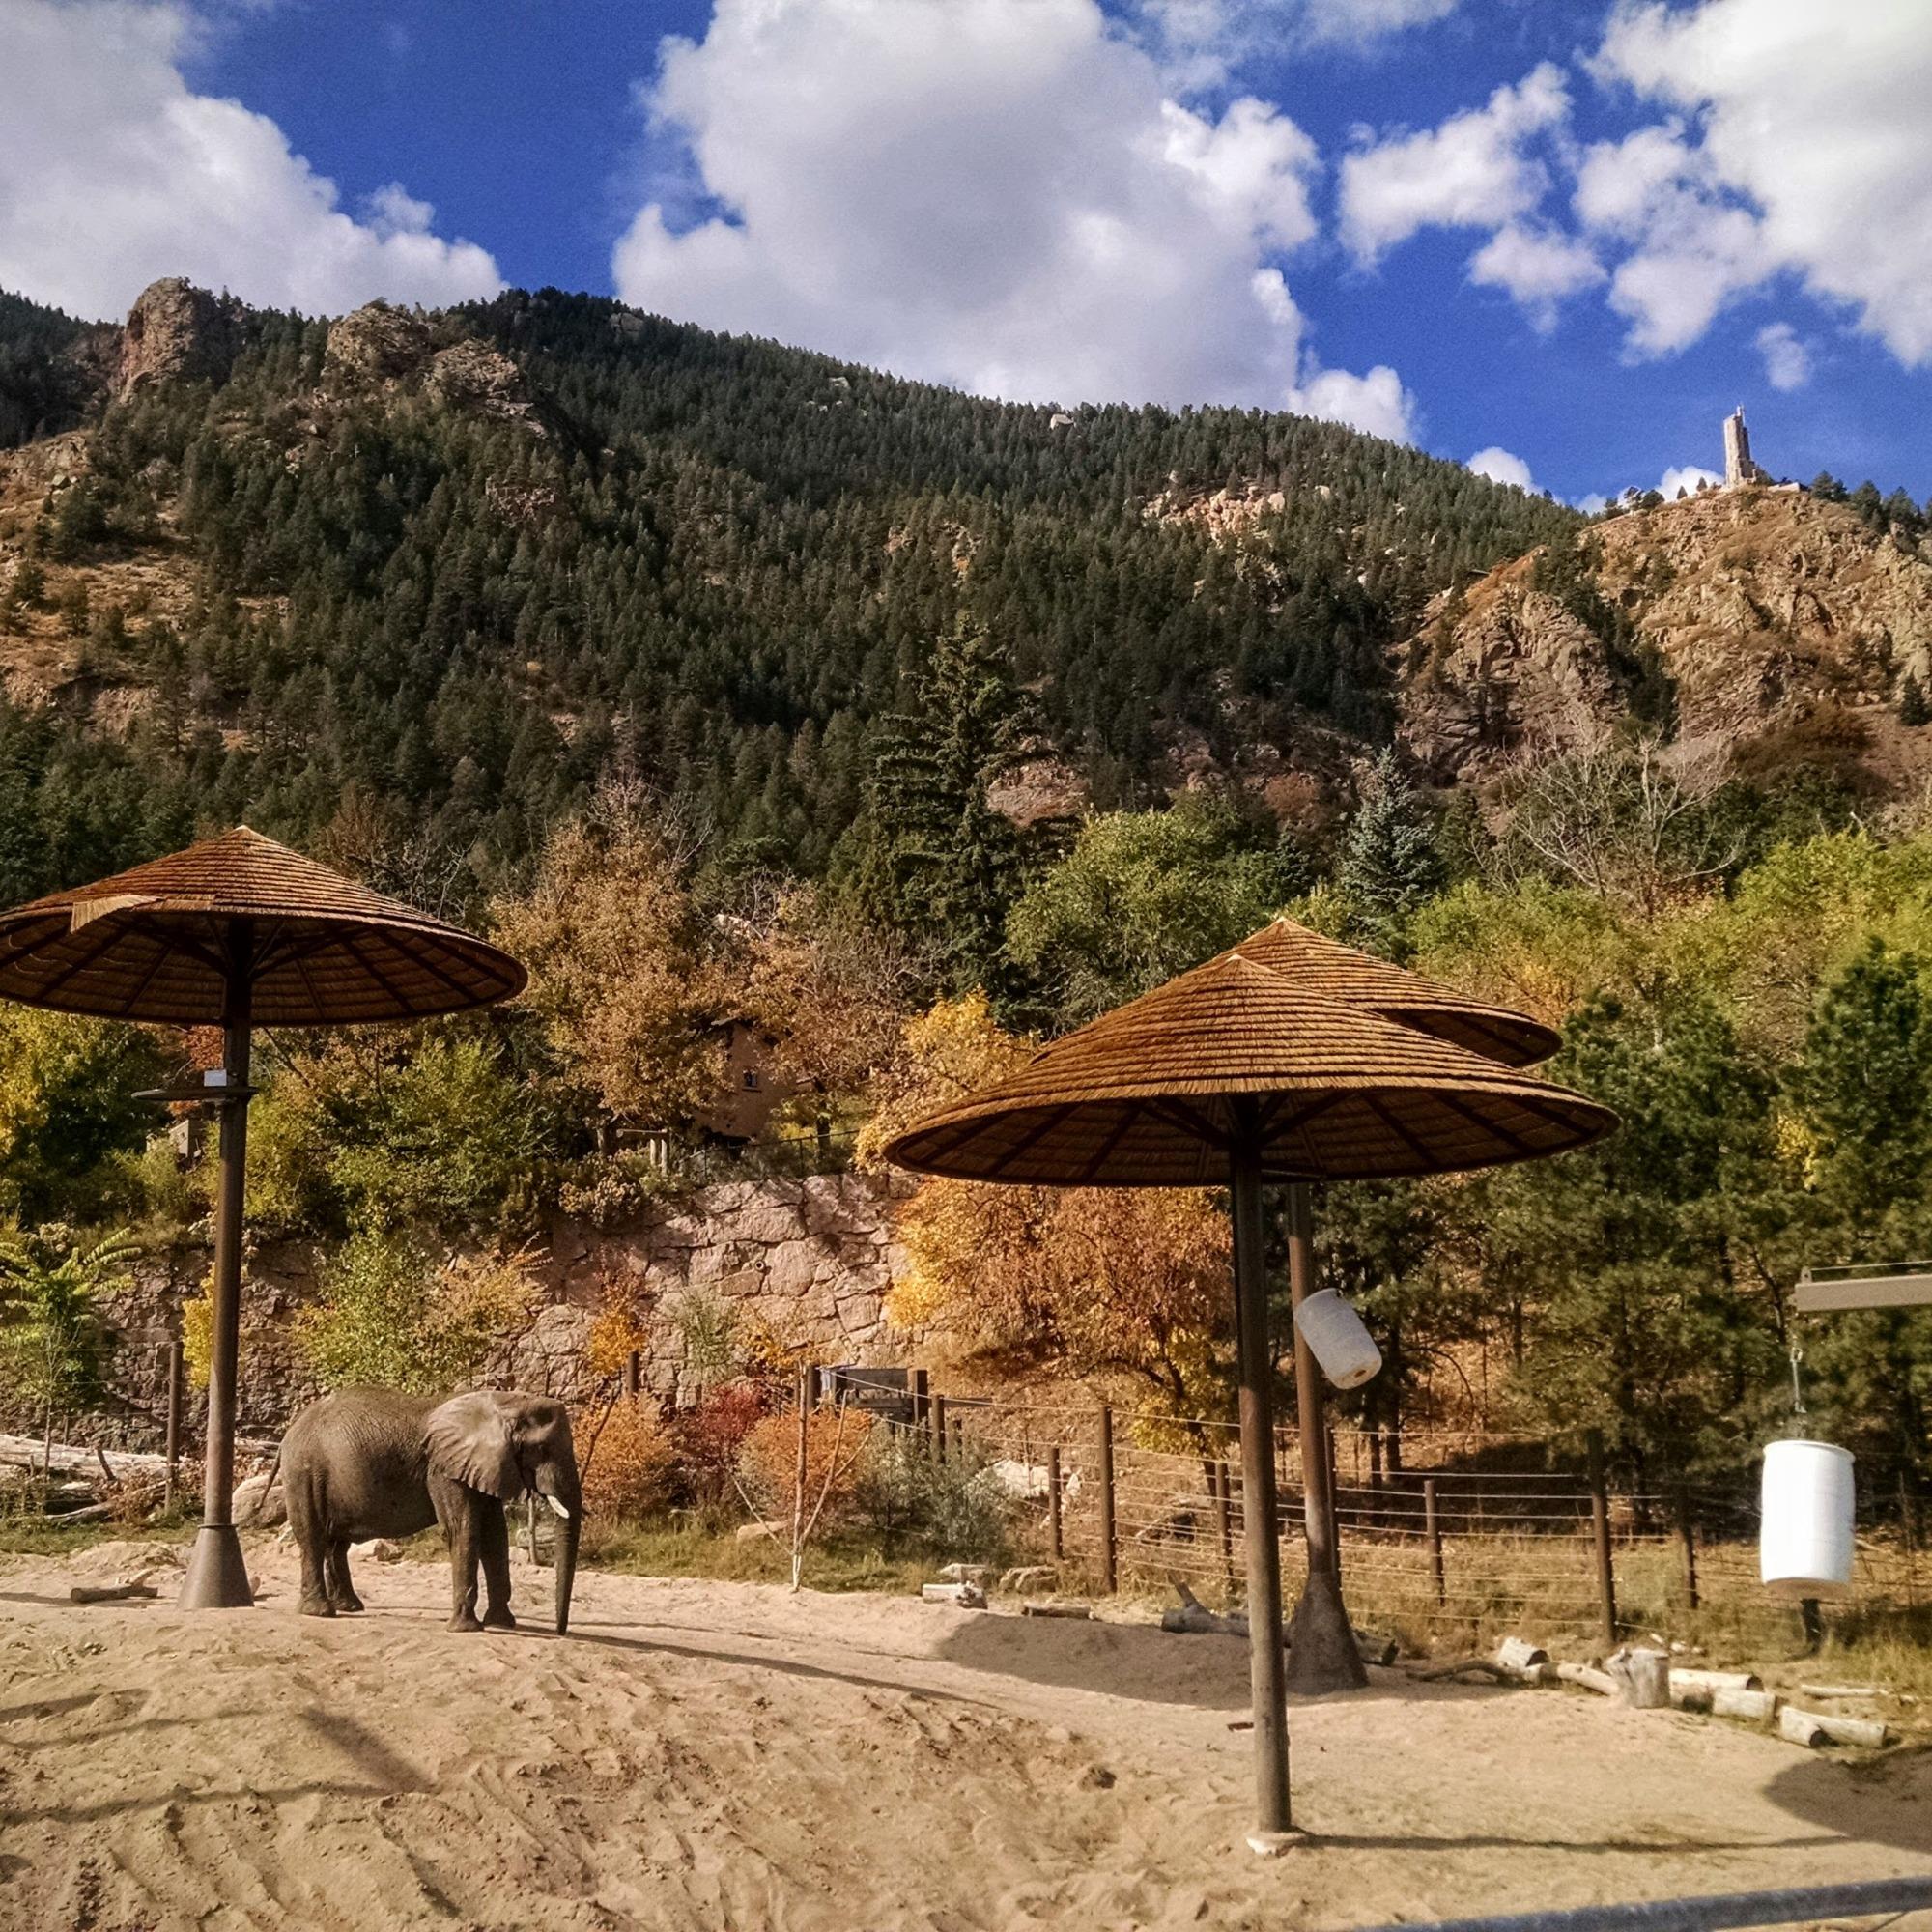 Elephant exhibit at Cheyenne Mountain Zoo